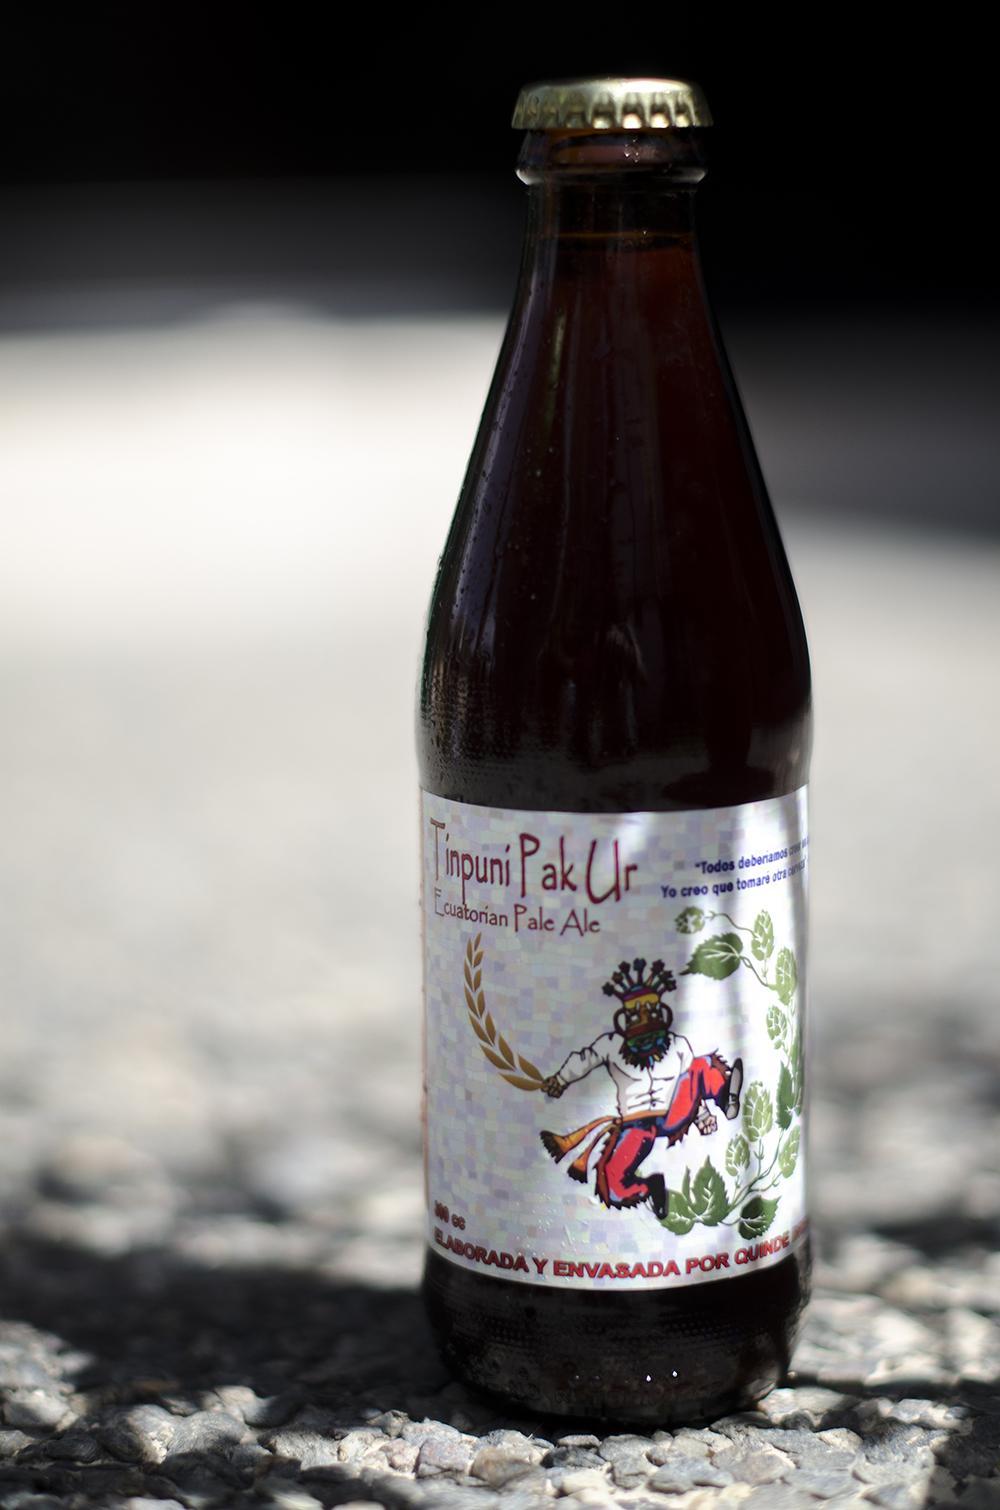 Quinde Brewery  - Tinpuni Pak Ur  Red Ale Horchata  6,1%